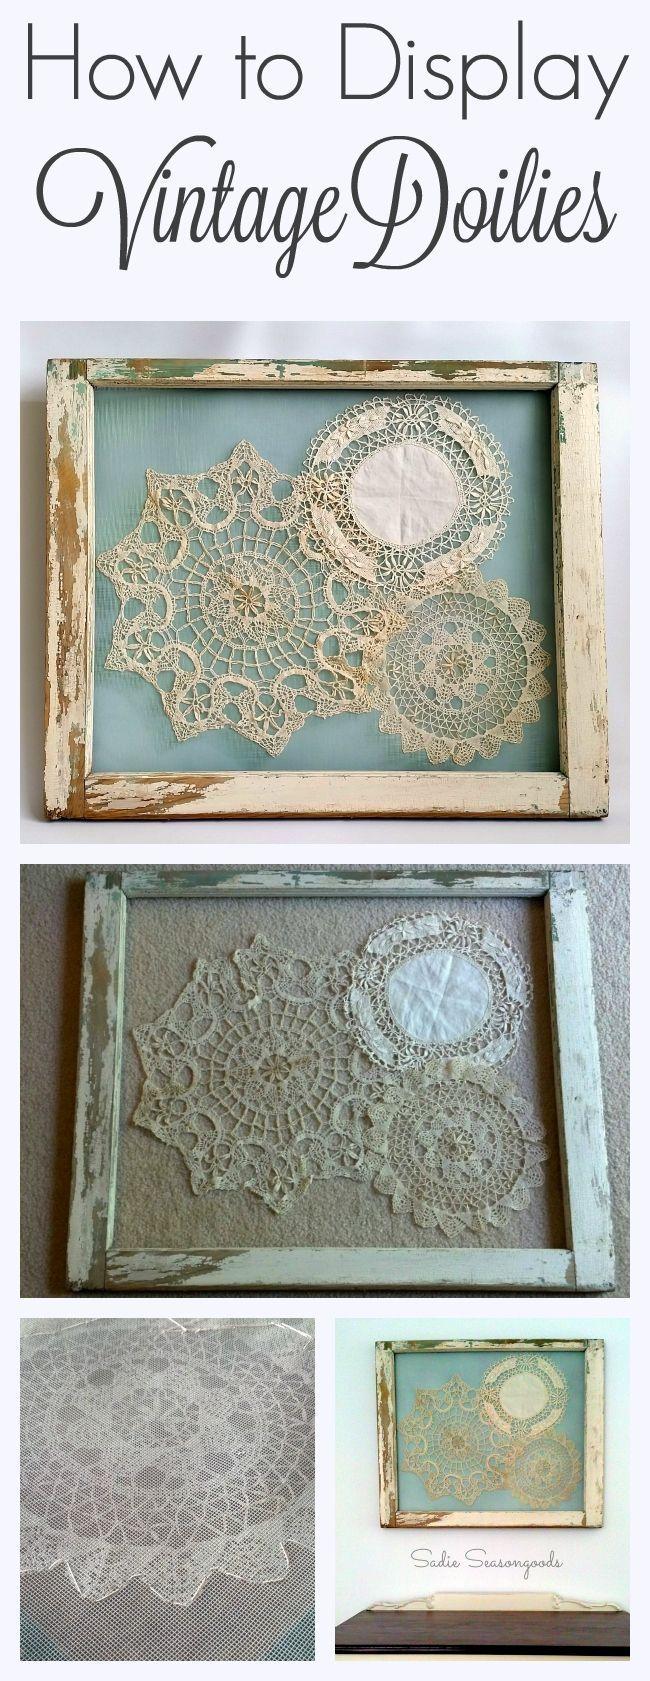 Best 25+ Window frame decor ideas on Pinterest | Old ...